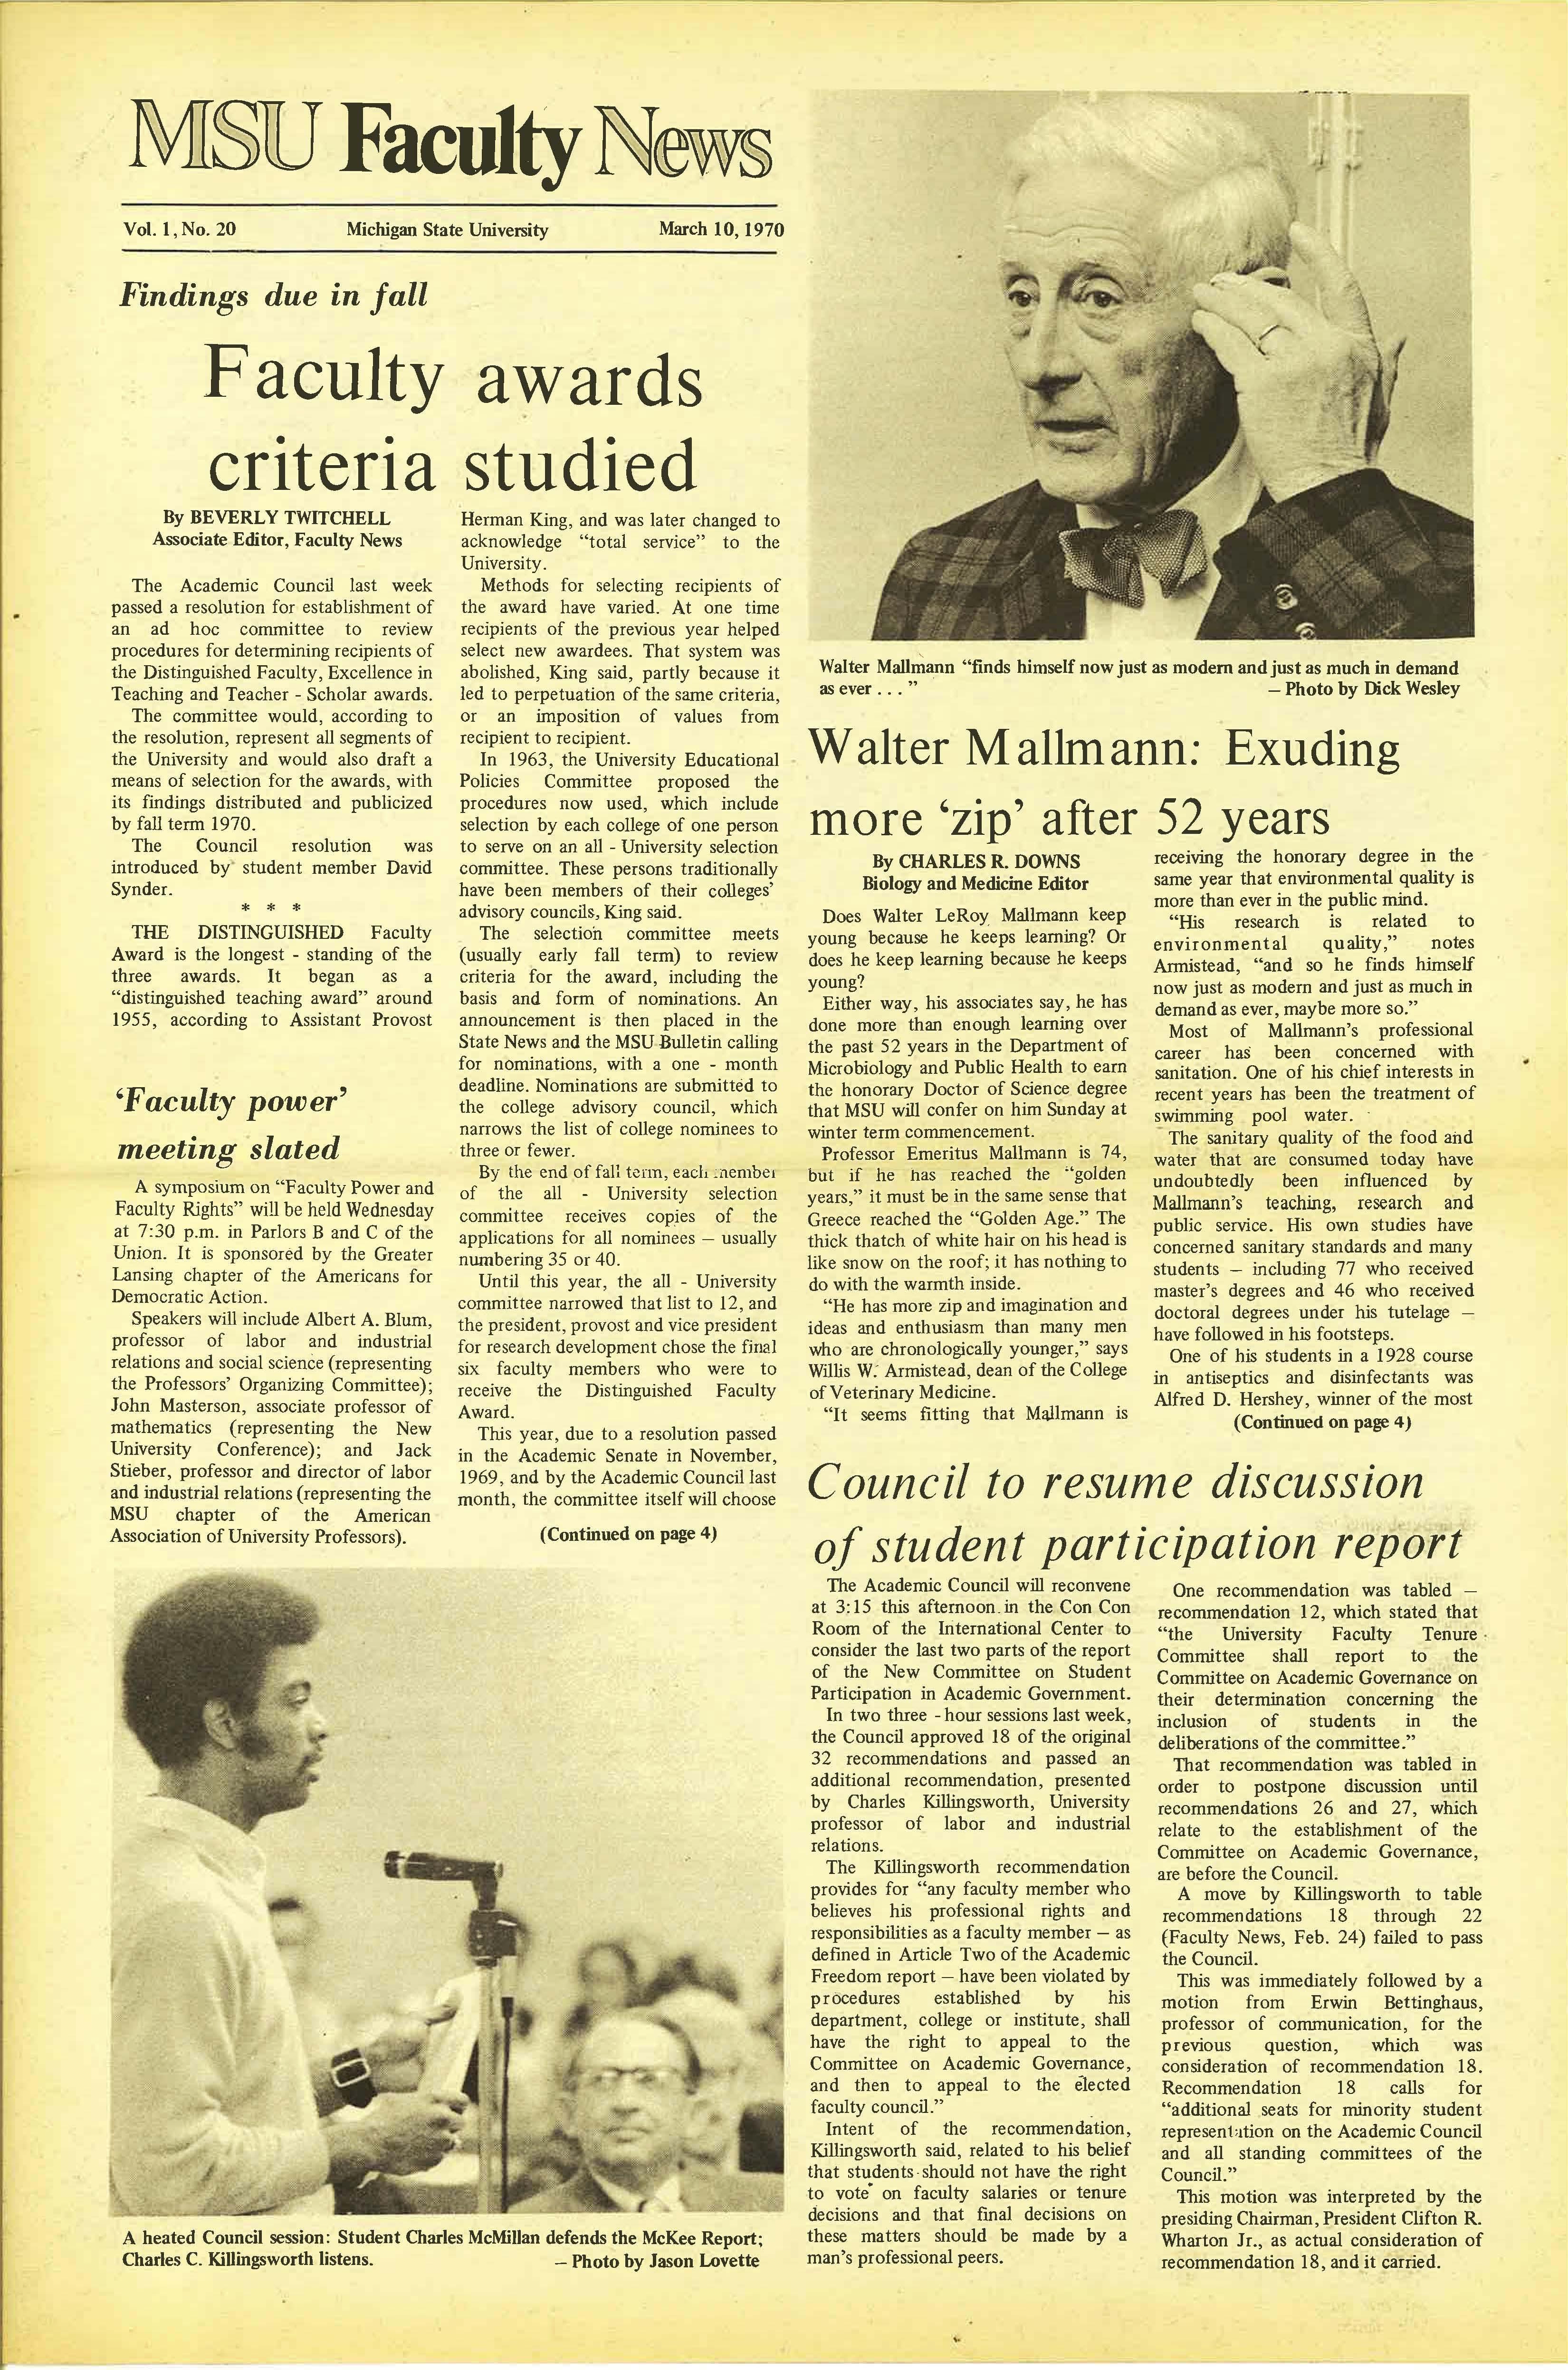 MSU News Bulletin, Vol. 1, No. 35, August 25, 1970